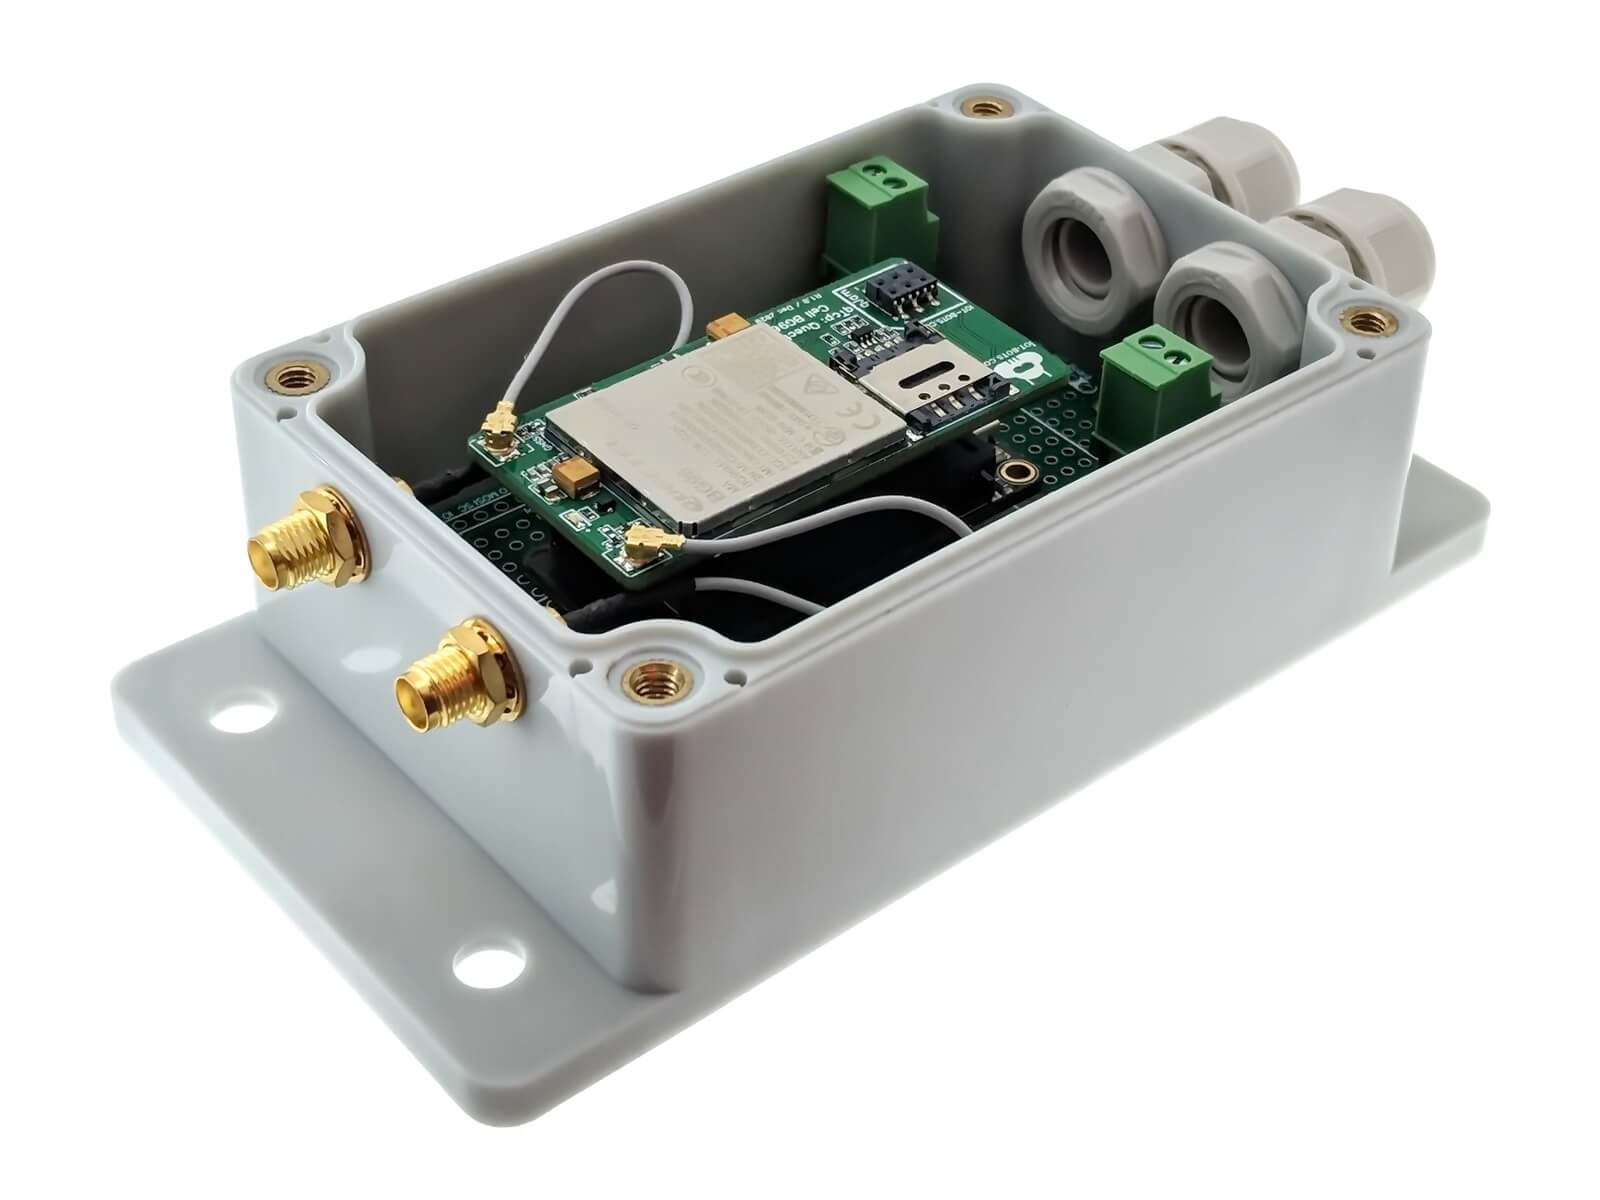 iotbotscom-qtop-cell-quectel-bg96-afc-qbox-kit